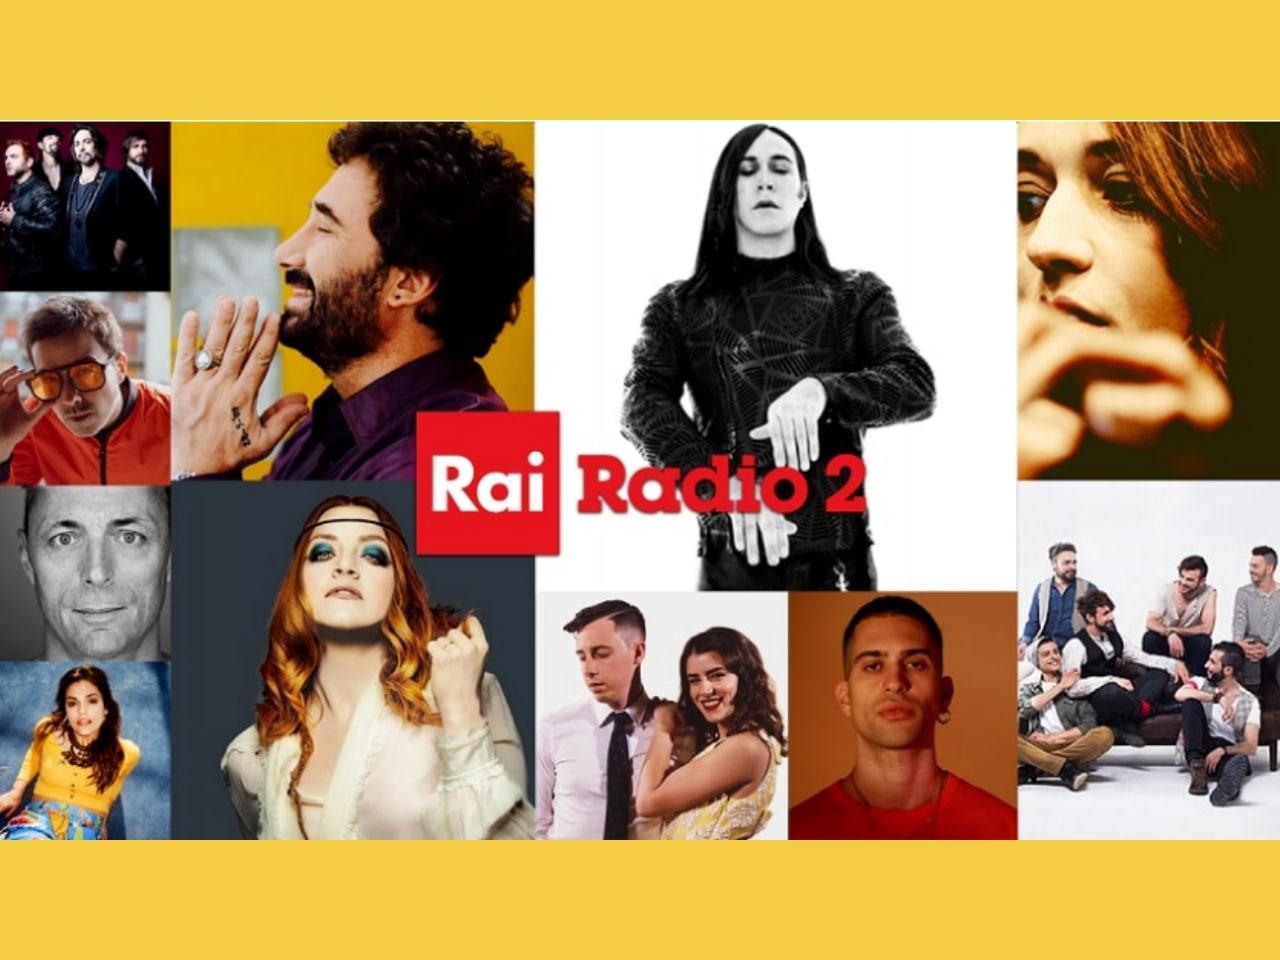 Rai Radio2 Summer Live